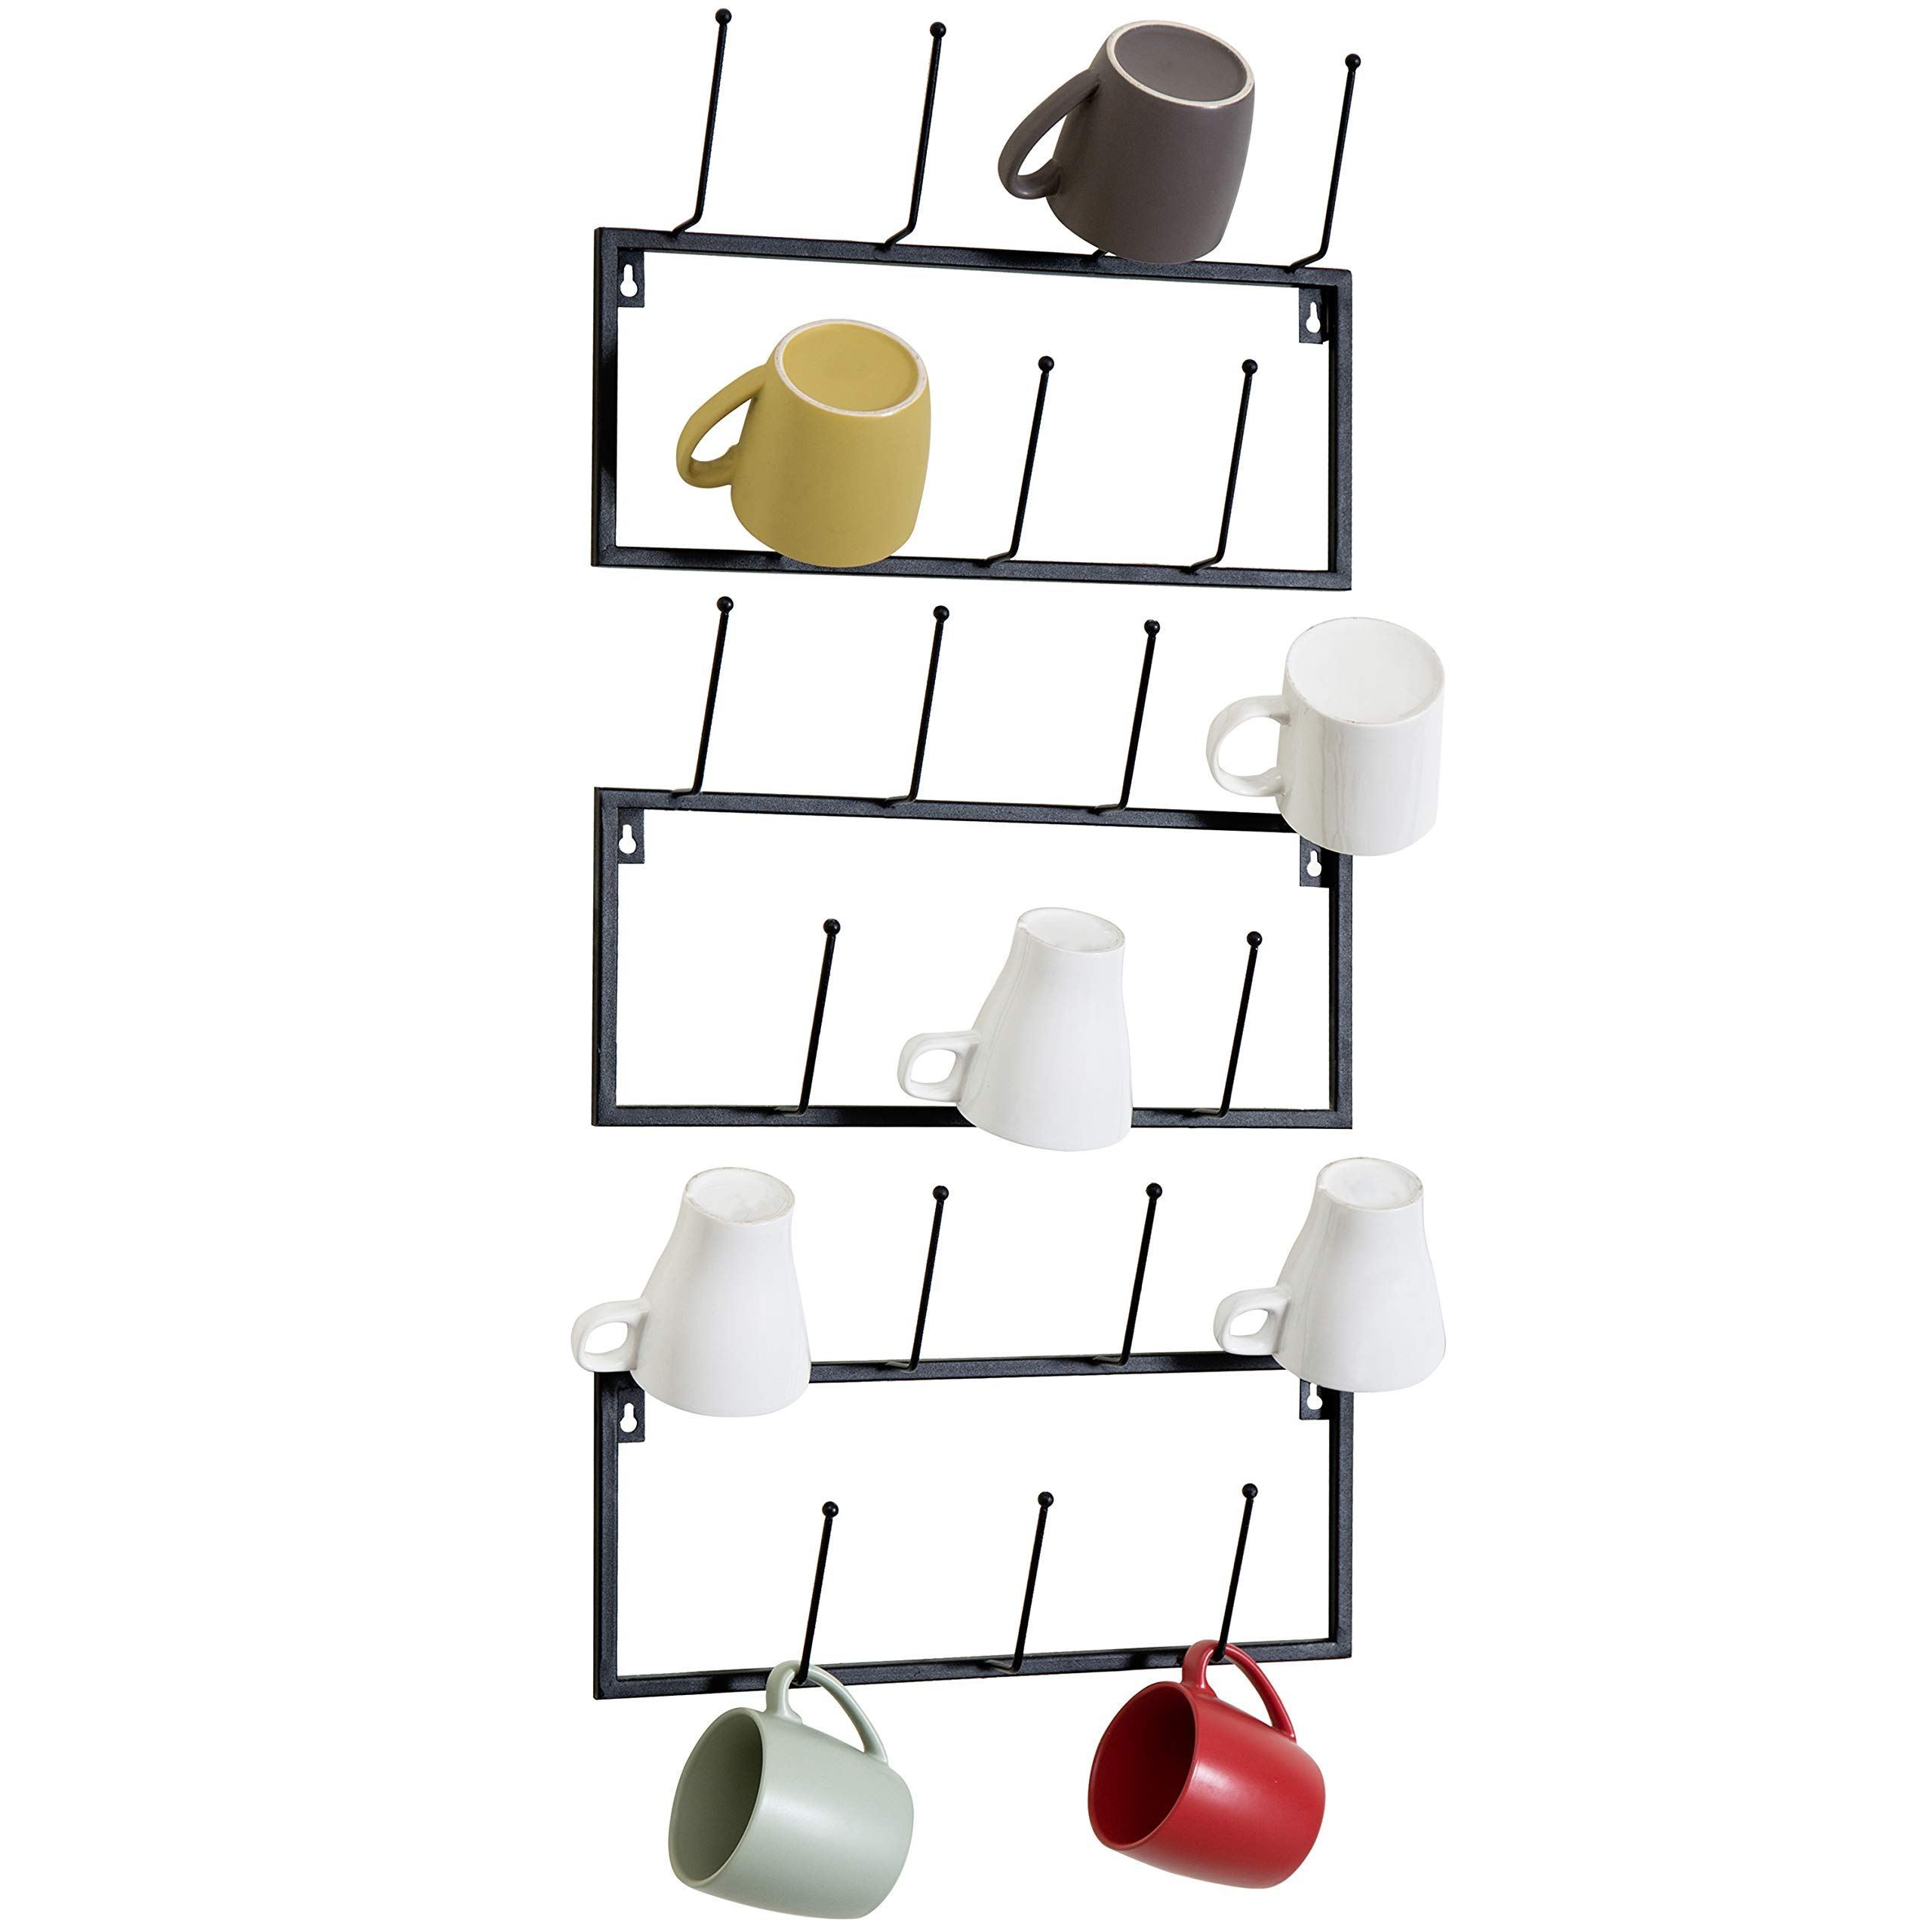 MyGift Set of 3 Black Metal Wall-Mounted Coffee Mug Storage Rack, 21-Hooks Total by MyGift